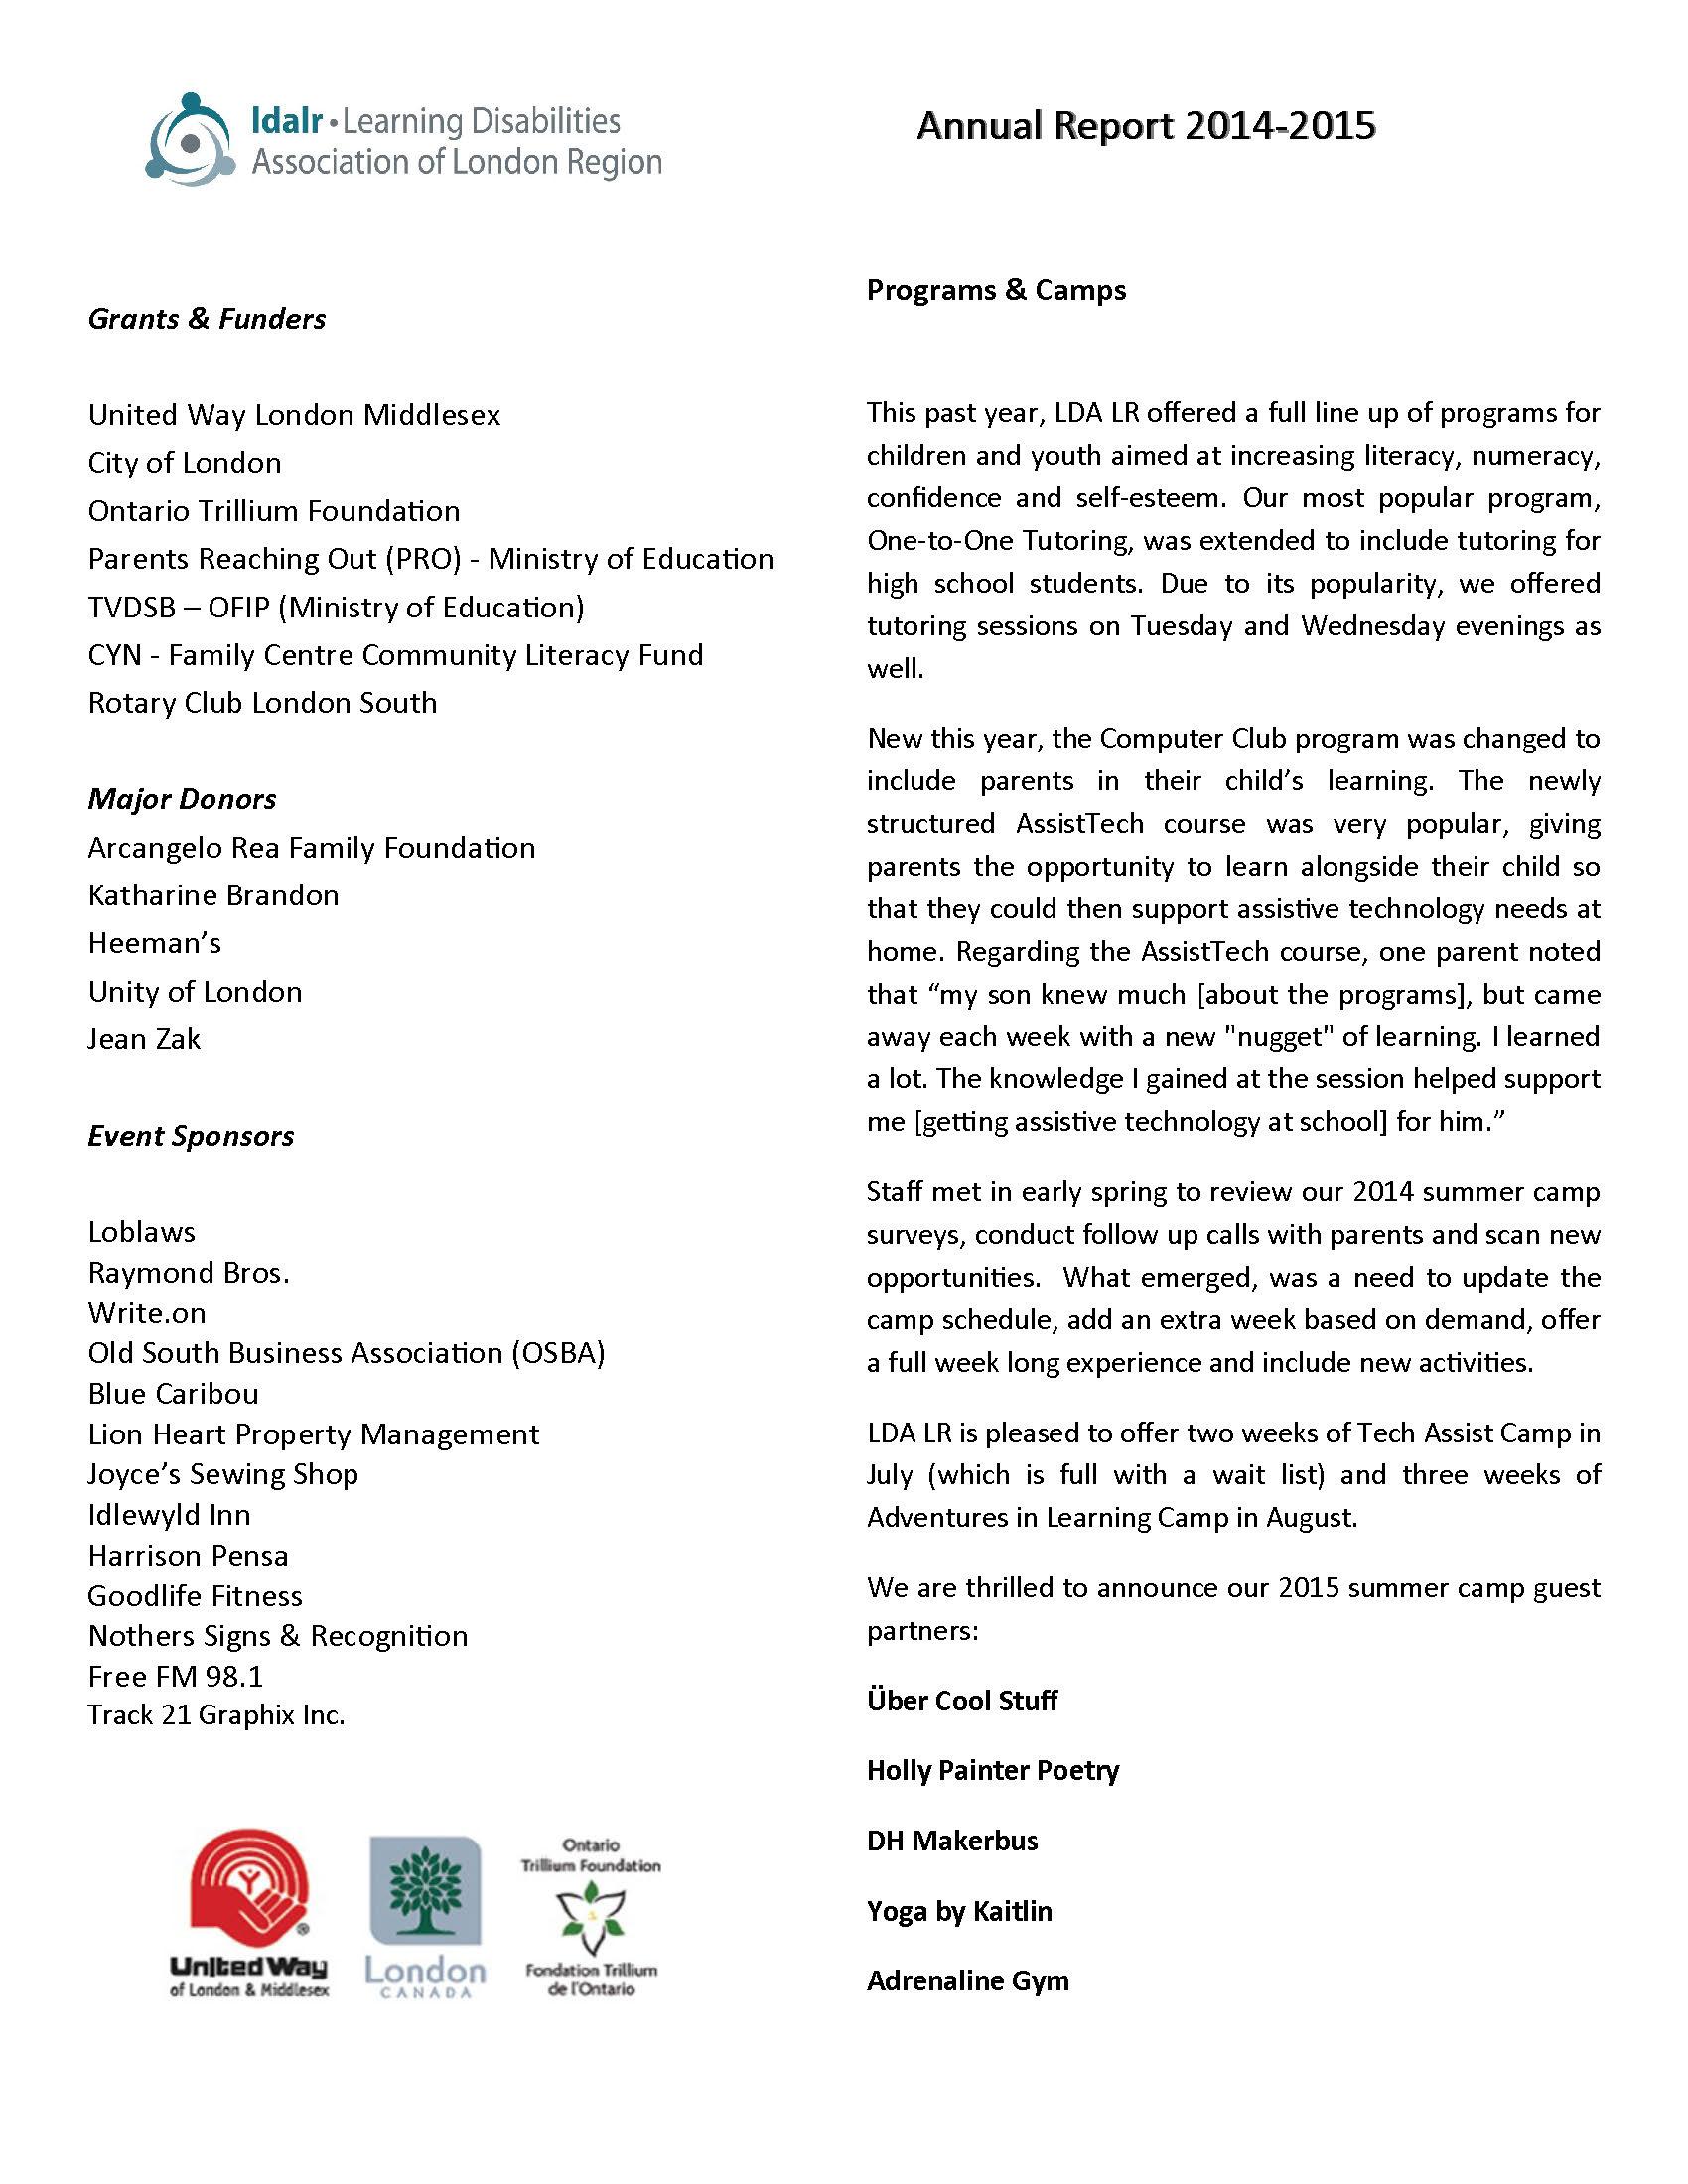 LDA LR Annual Report 2014-2015_PRINT_Page_6.jpg